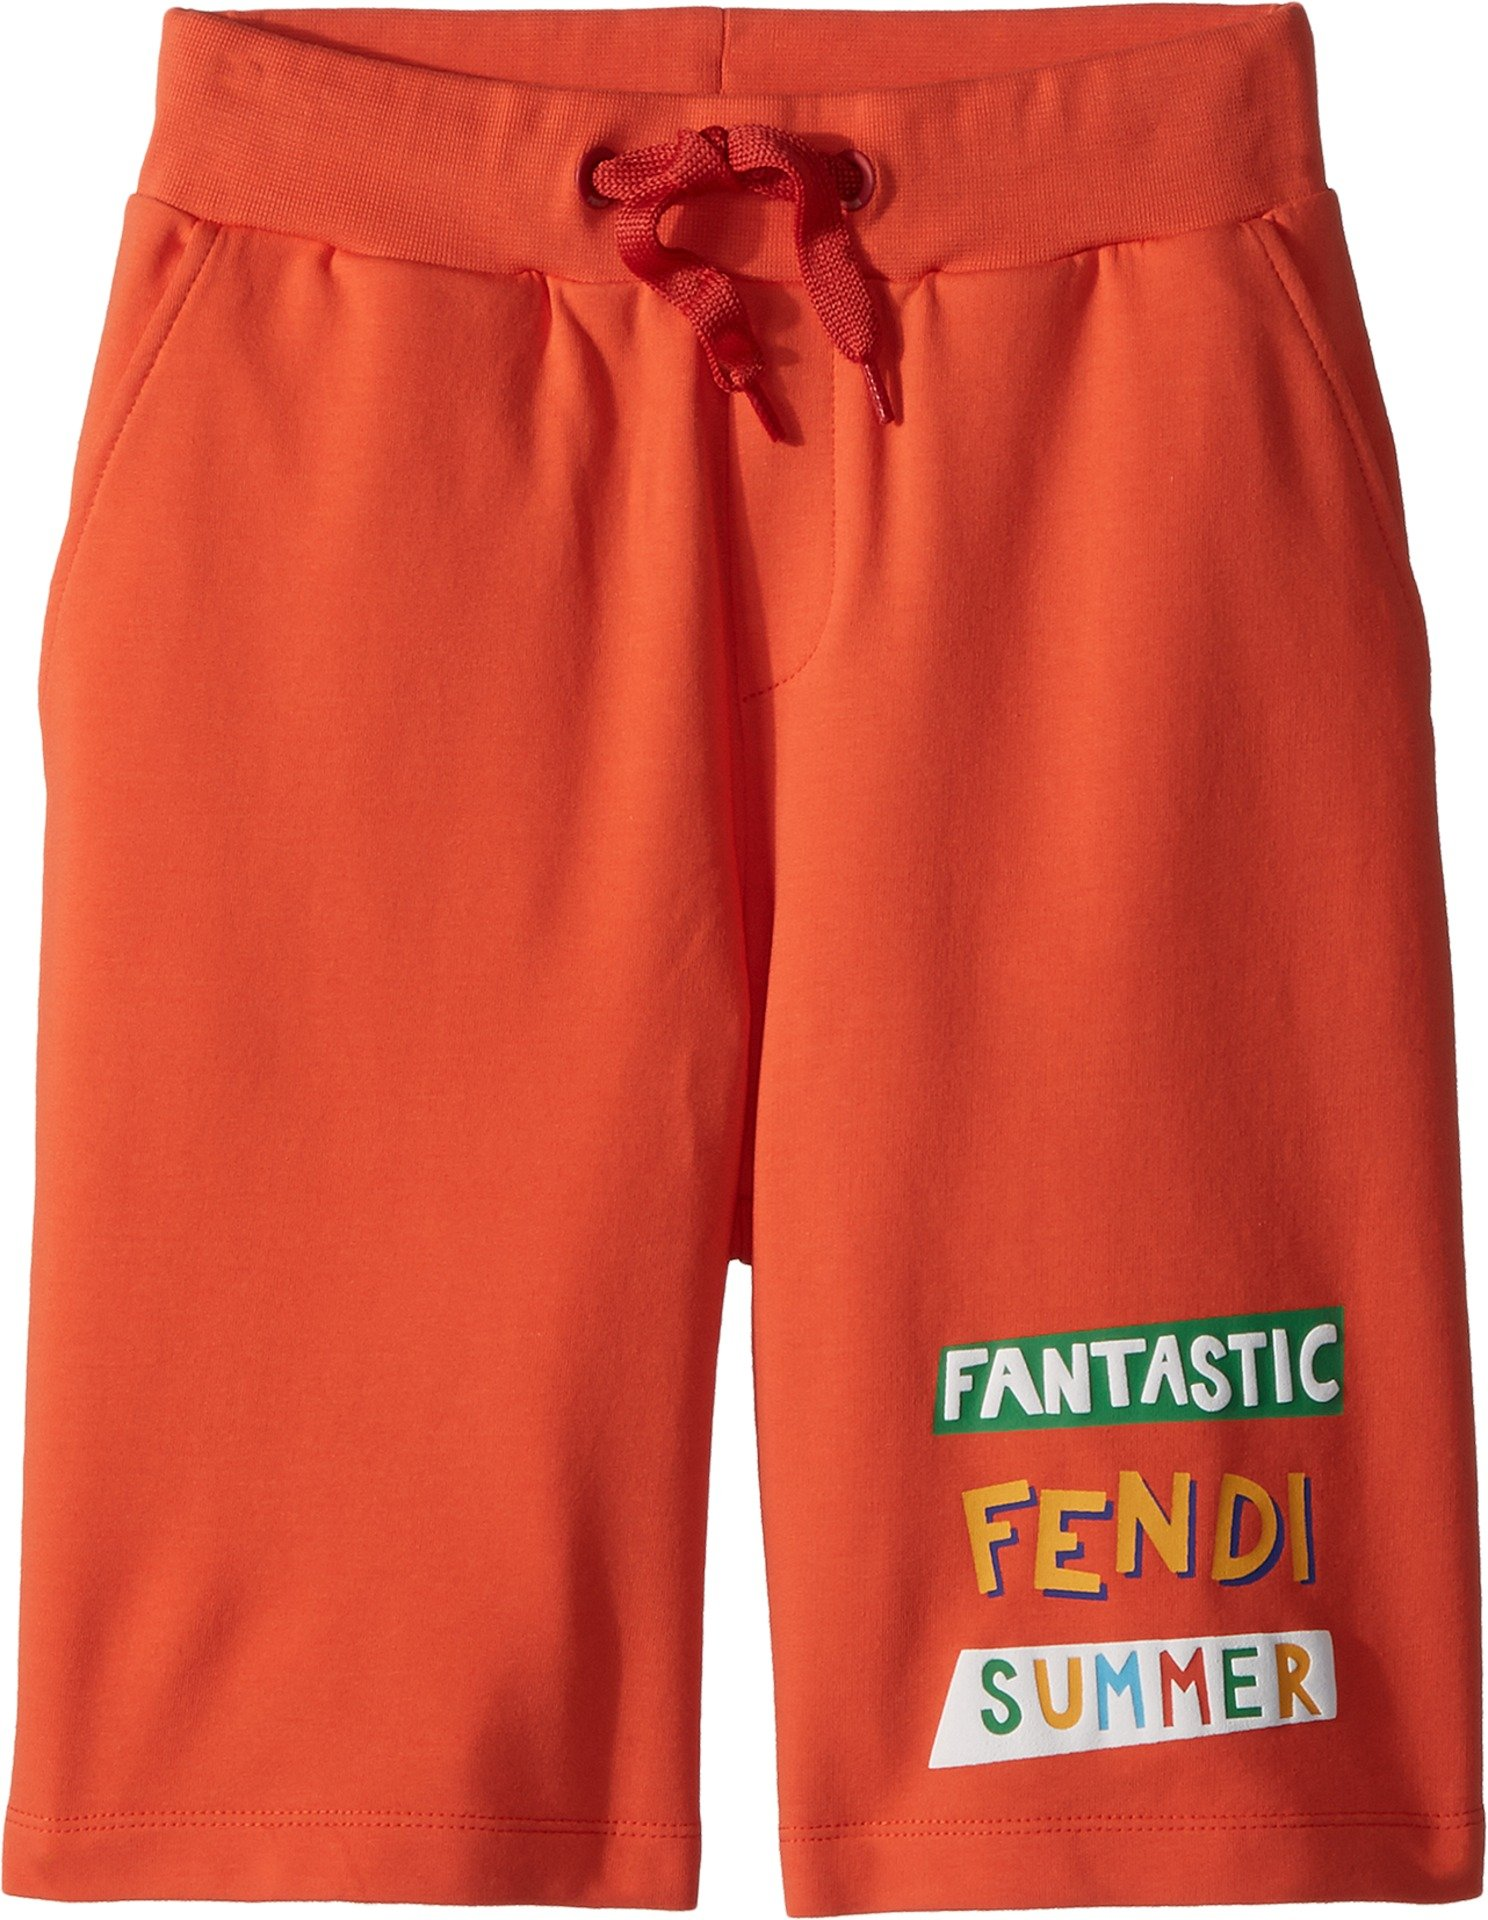 Fendi Kids Boy's 'Fantastic Fendi Colours' Jogging Shorts (Little Kids) Orange 8 Years